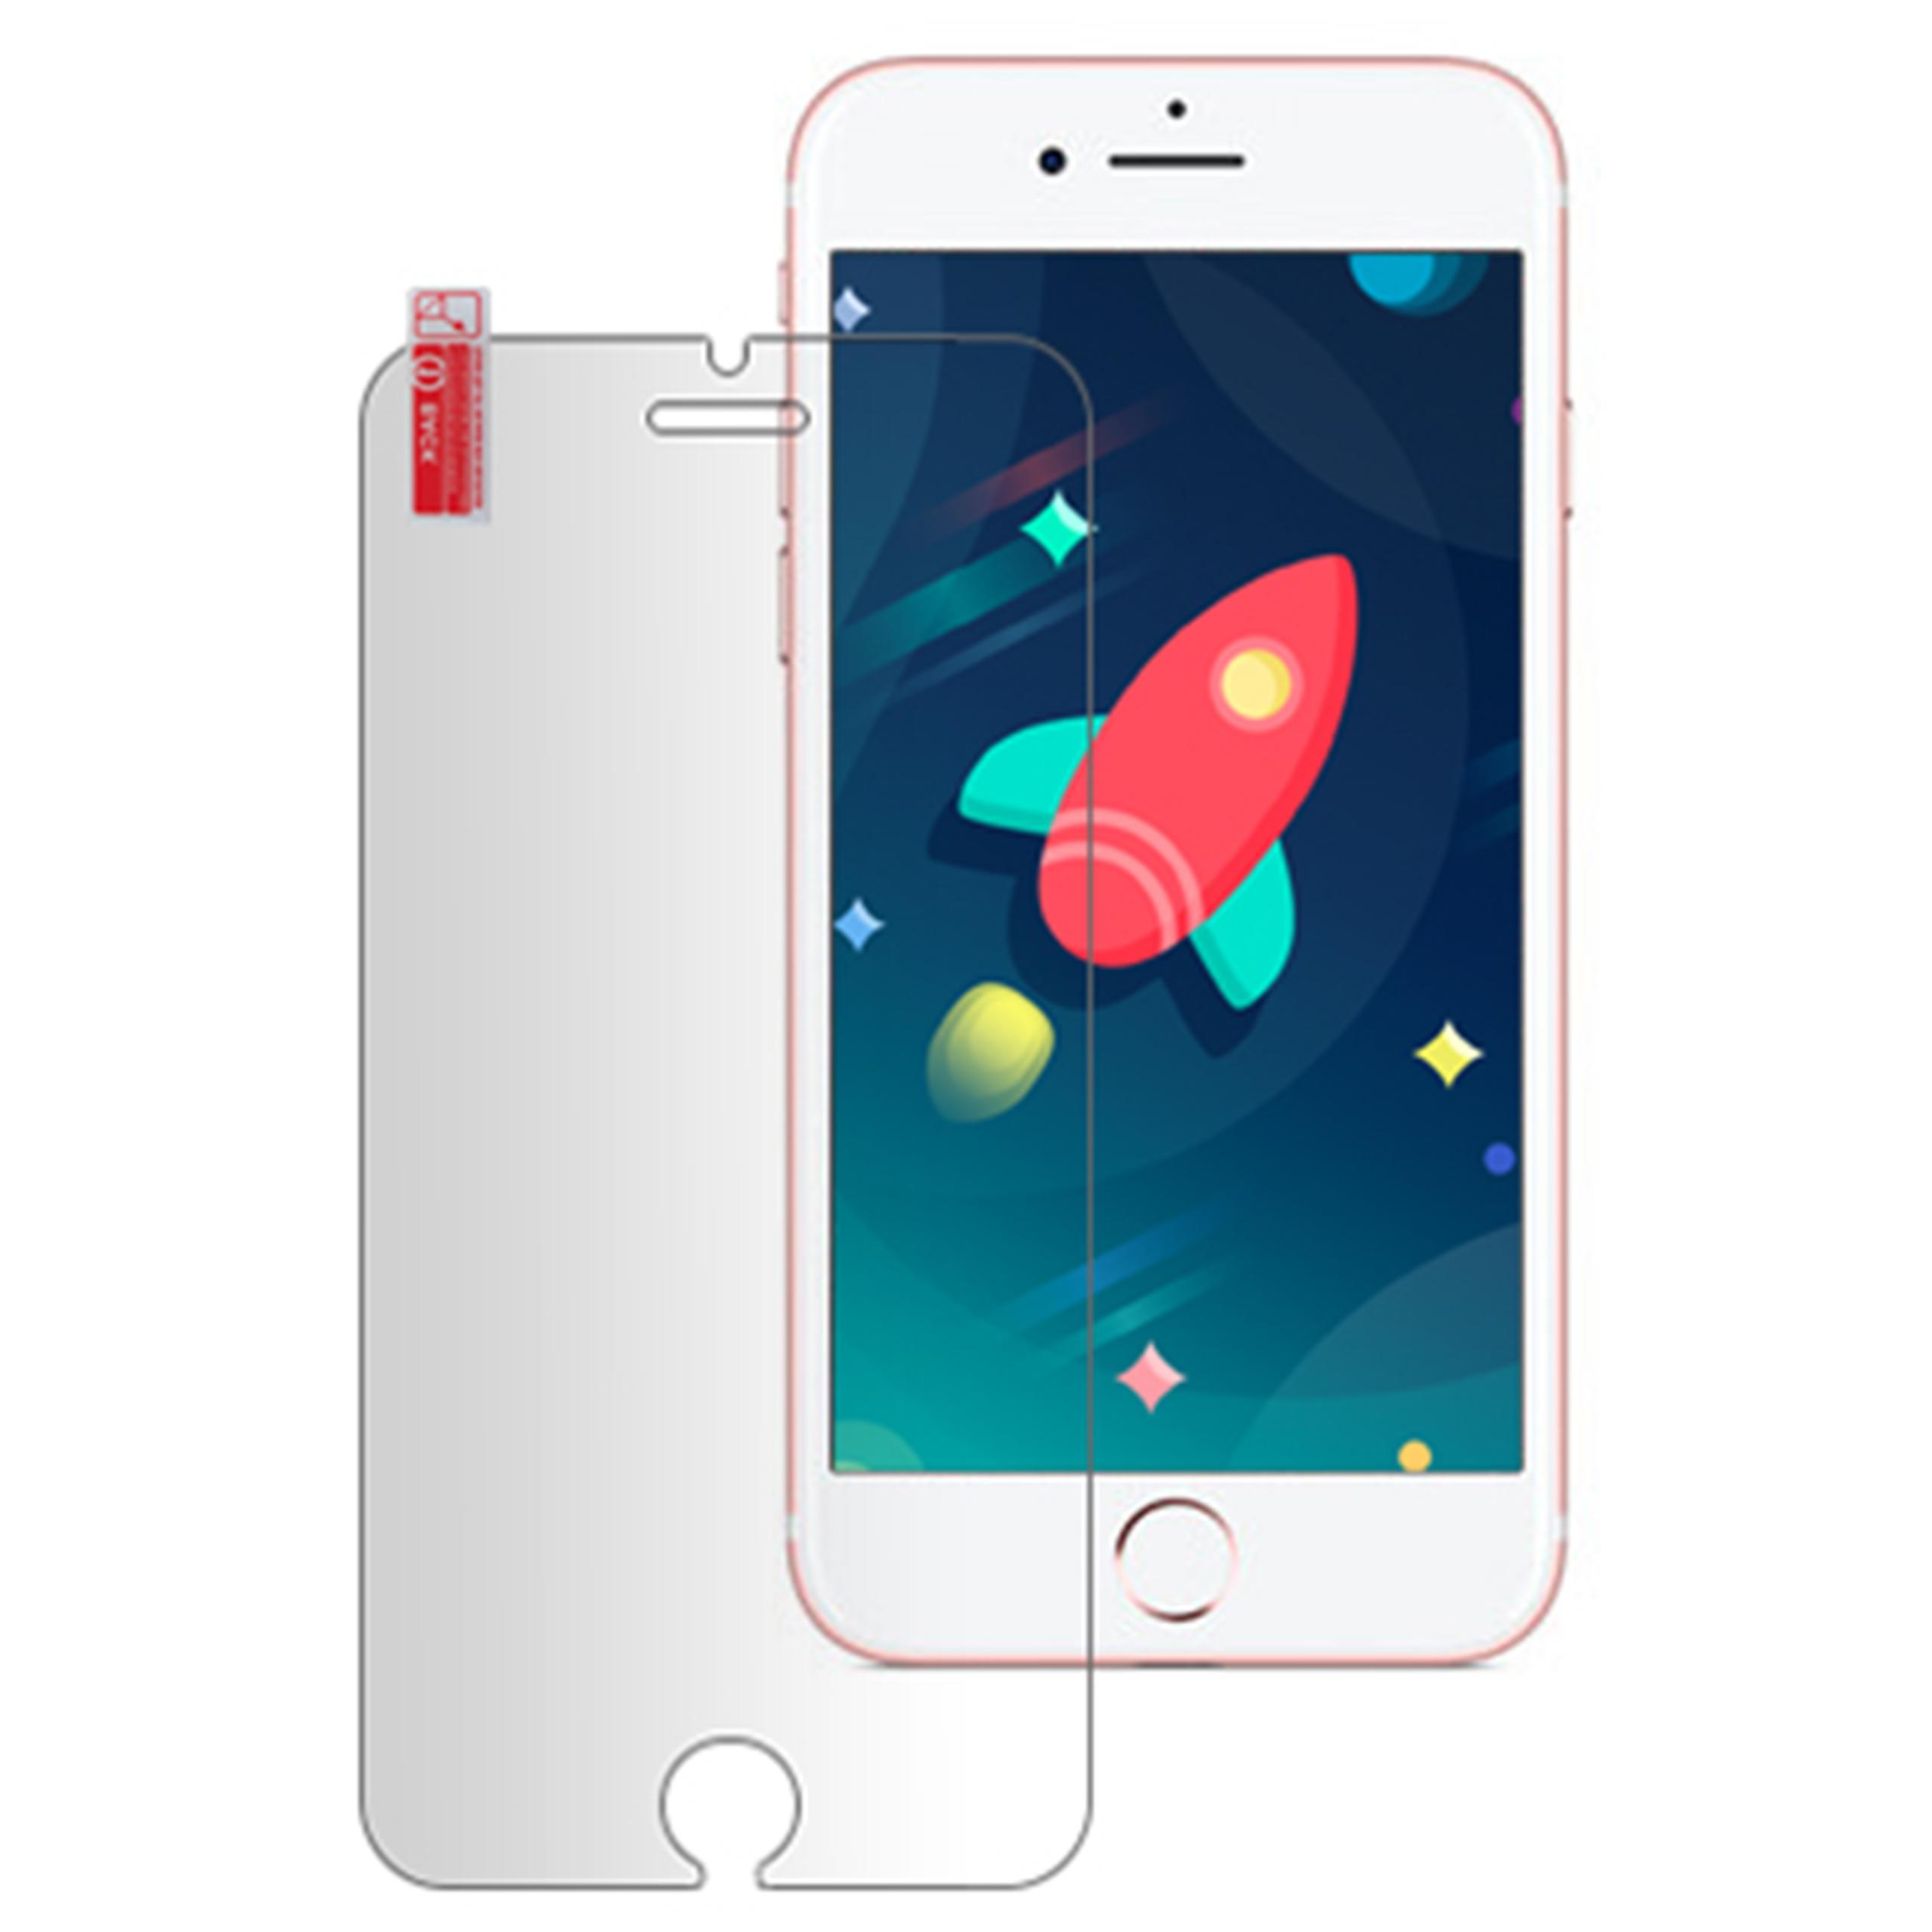 Temperované sklo 9h na Apple iPhone 7/8 + GRATISY